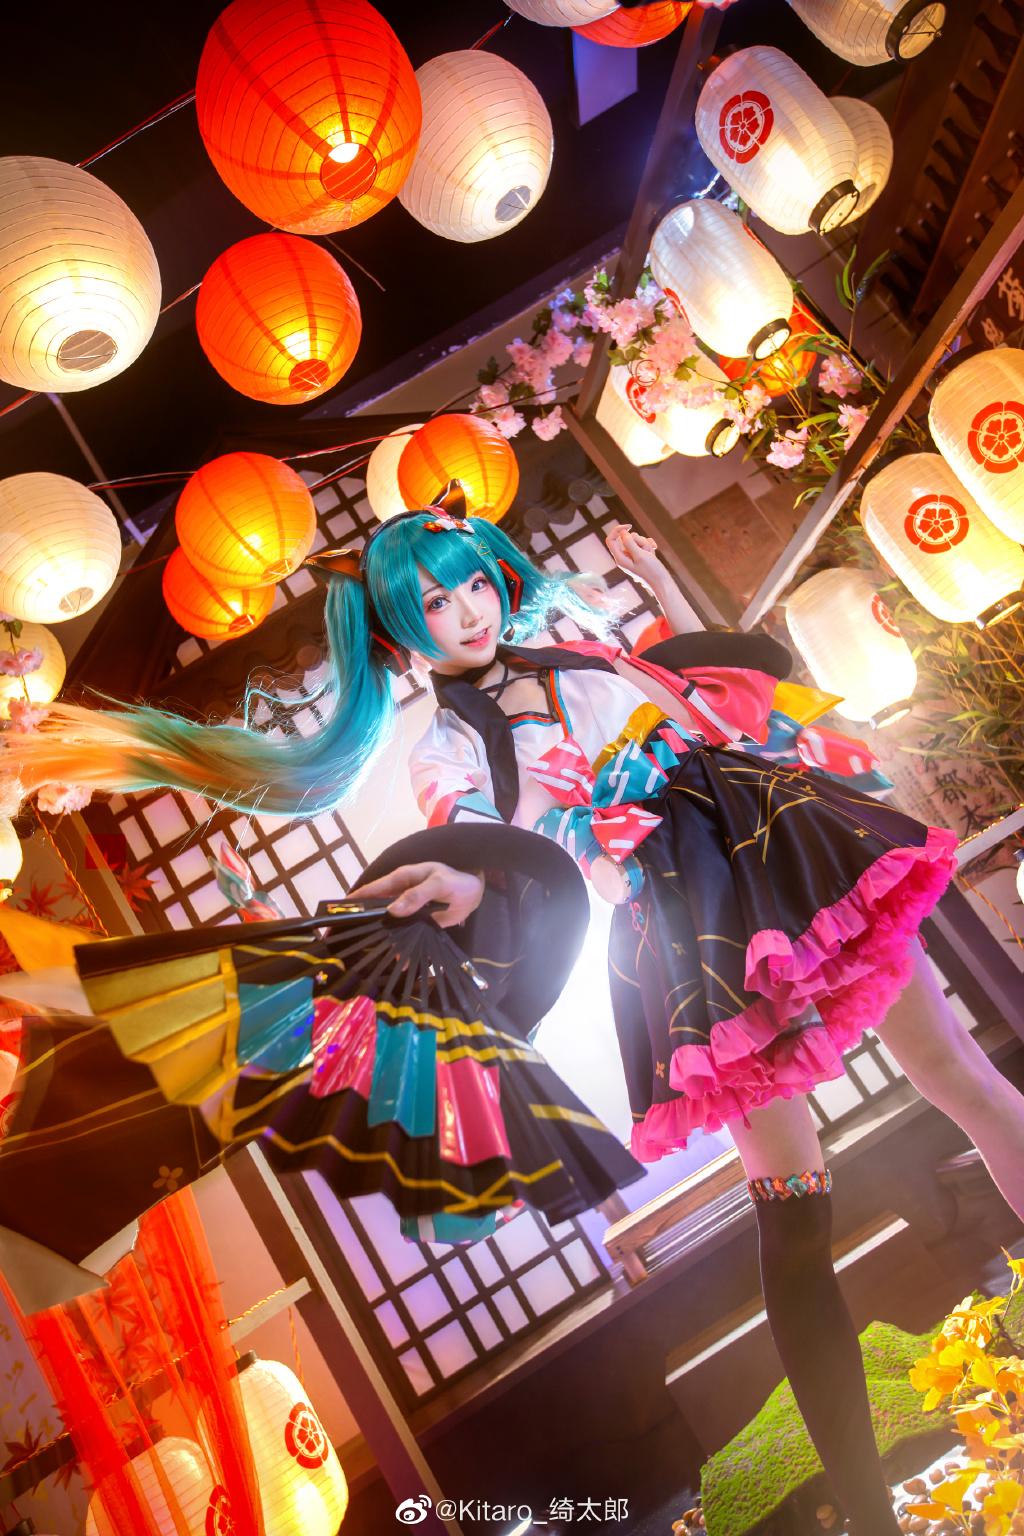 [COS]cosplay 初音未来 miku cos正片 @Kitaro_绮太郎 COSPLAY-第5张